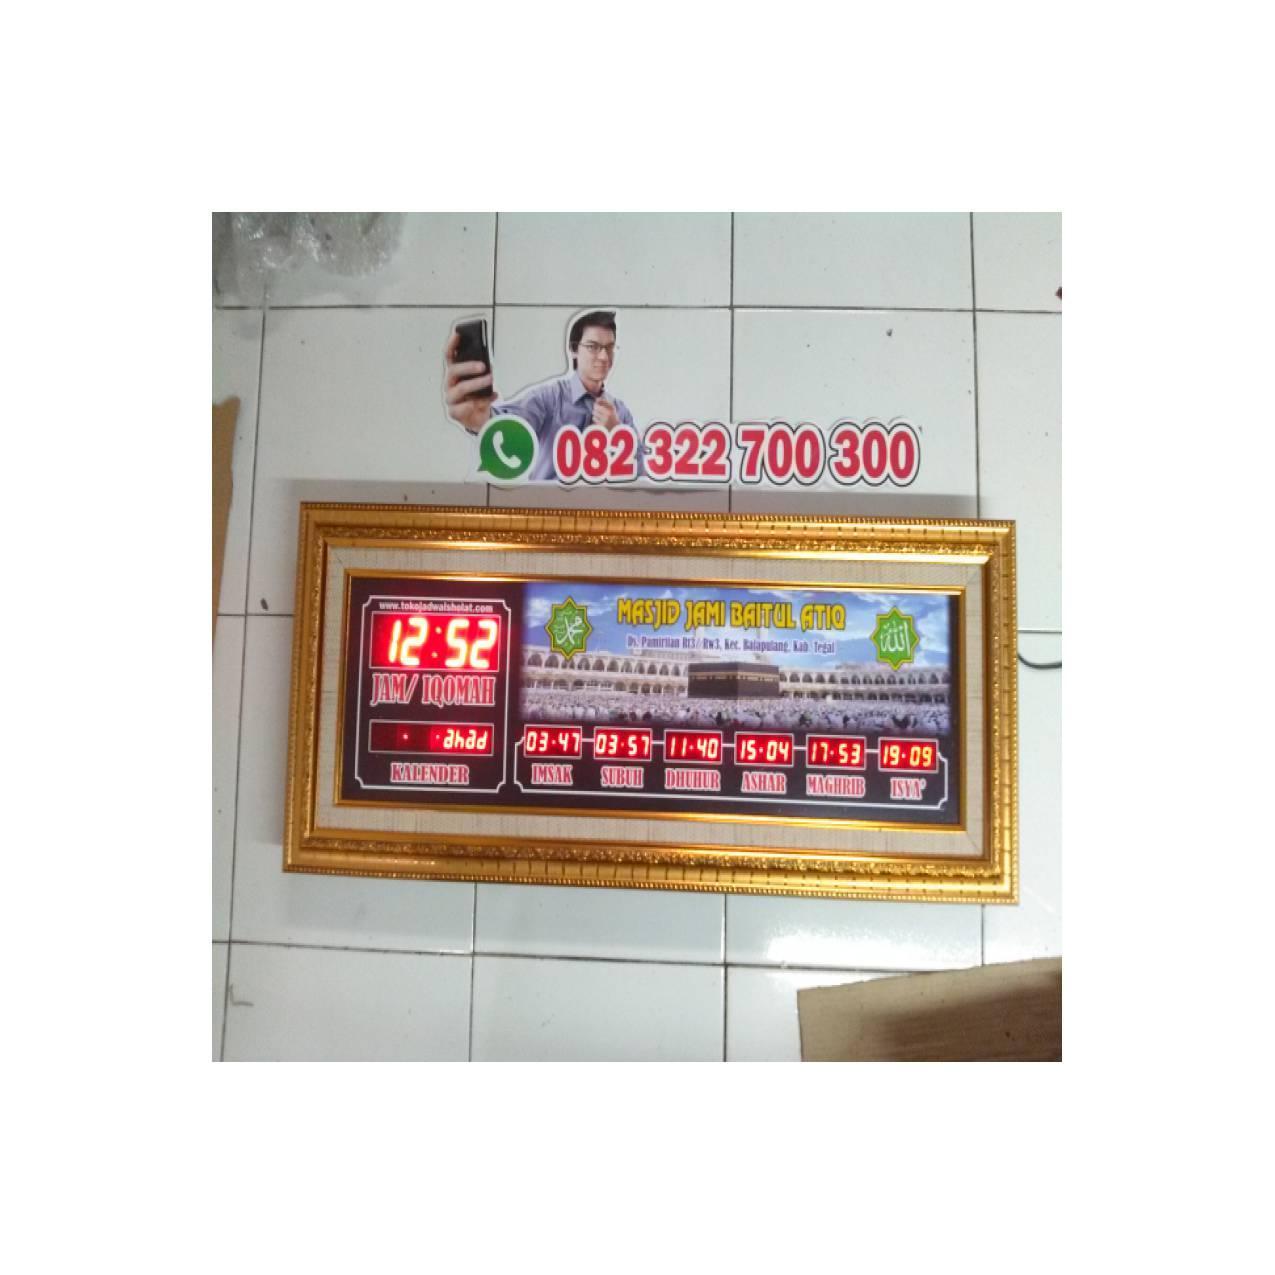 jam waktu sholat digital, jadwal masjid digital + alarm + timer iqomah